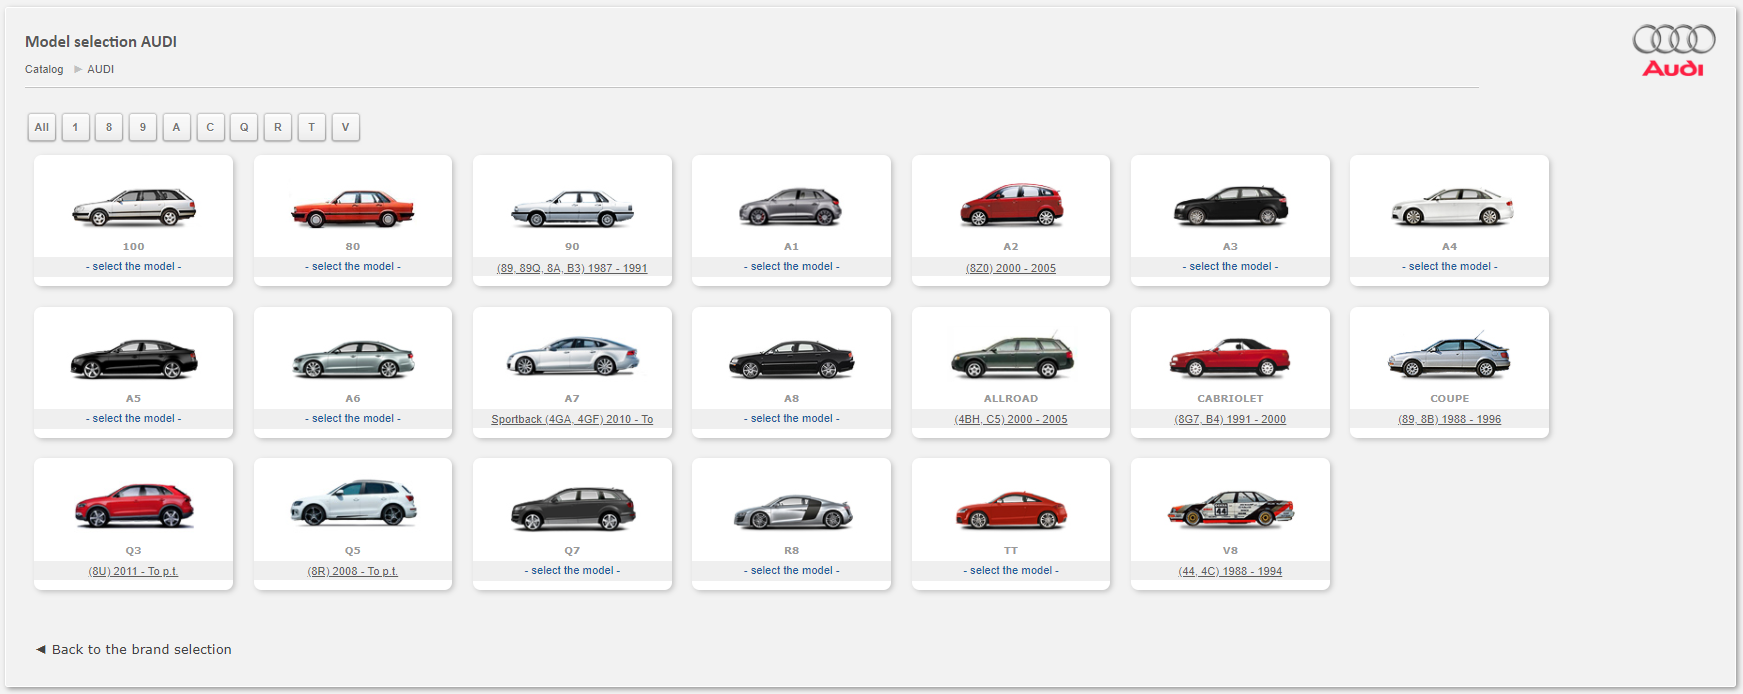 Audi Auto Spare Parts